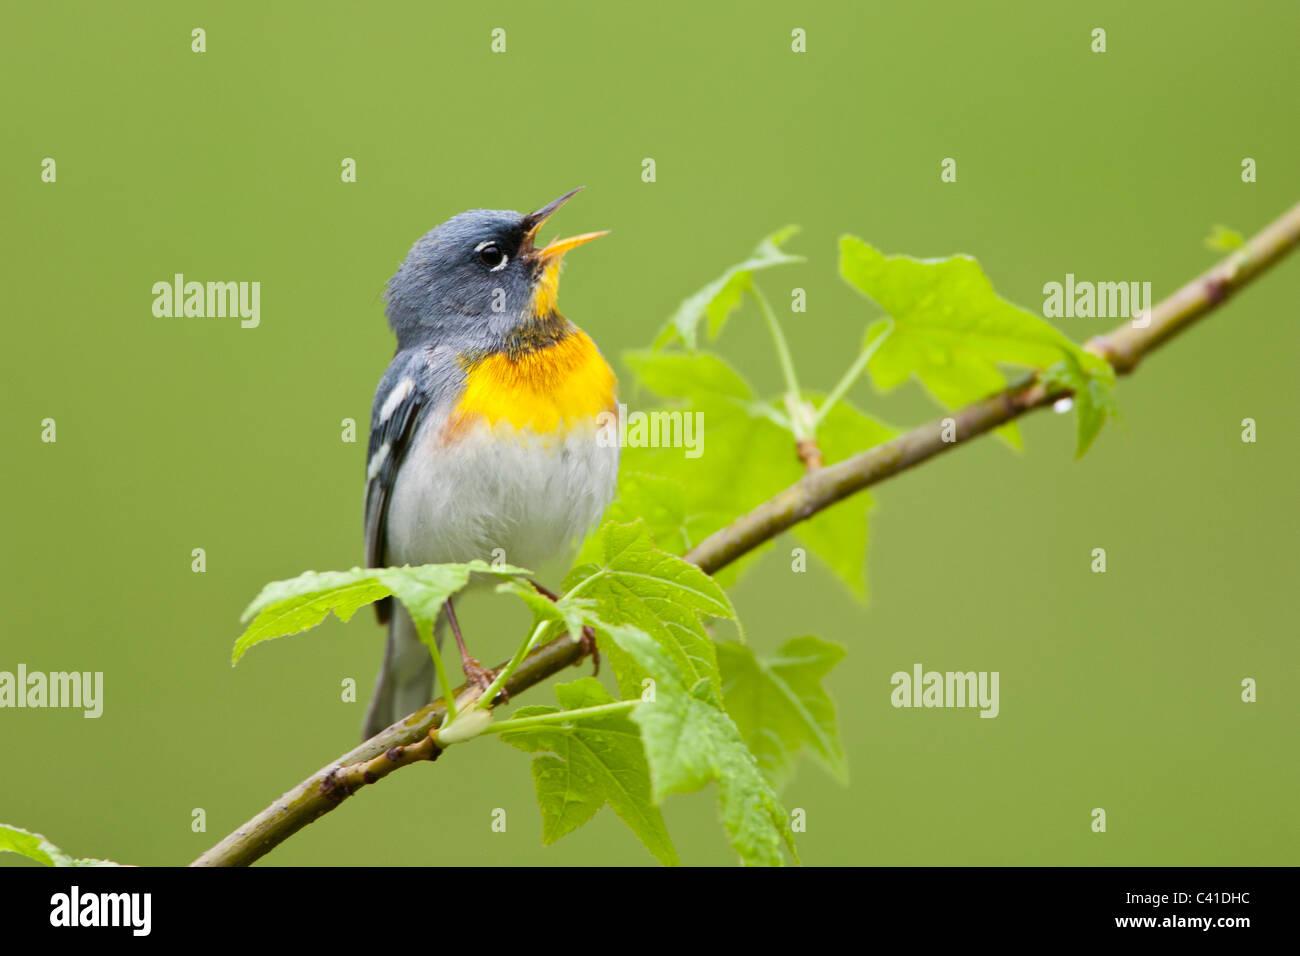 Northern Parula Warbler Singing - Stock Image